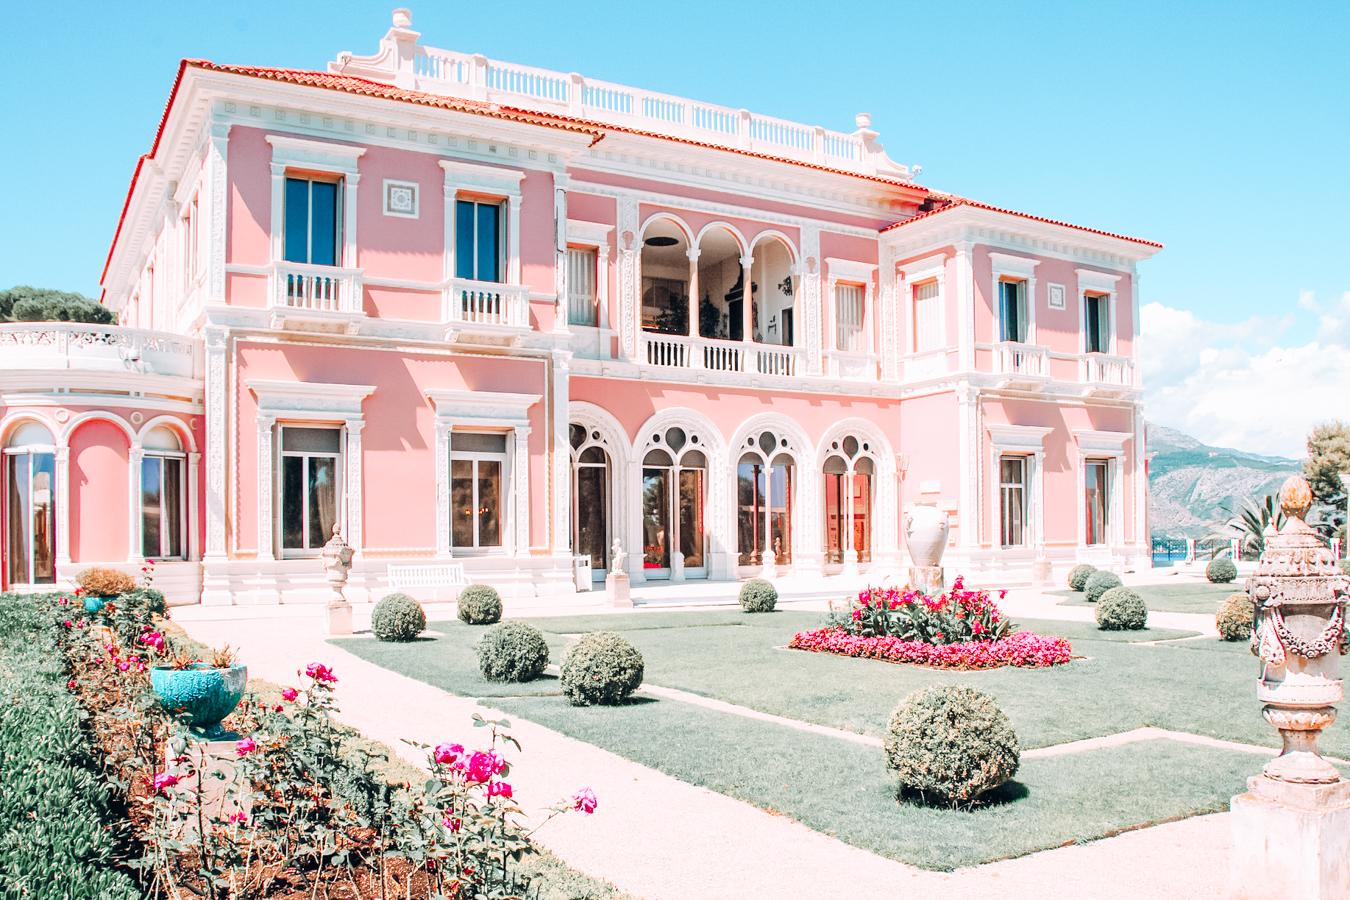 Pink building in Saint-Jean-Cap-Ferrat